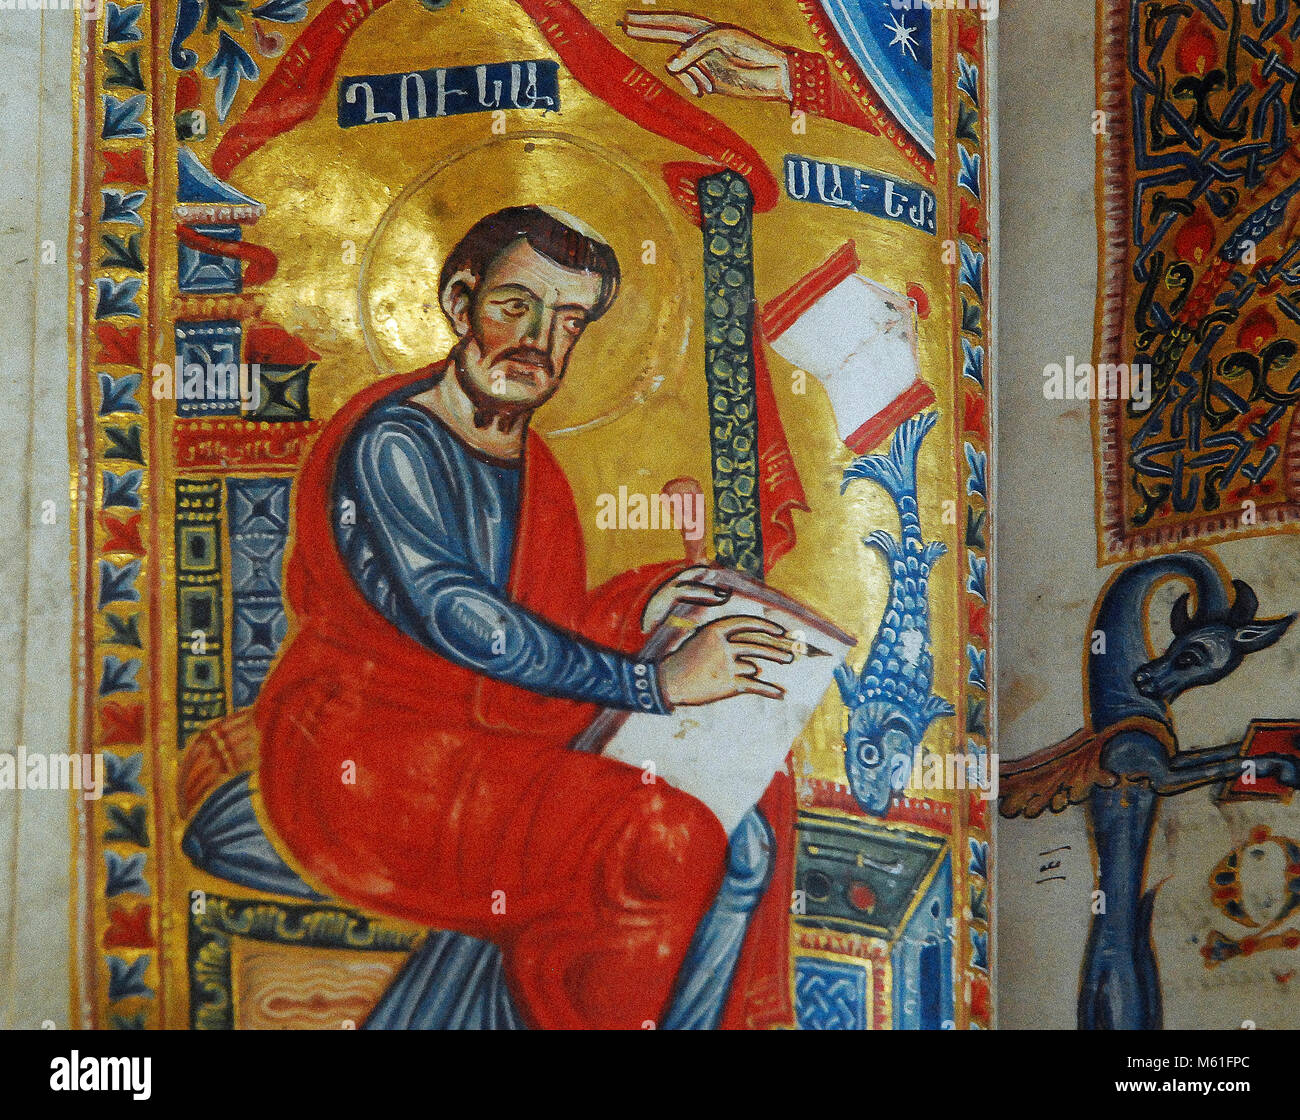 Armenia Yeveran Materadaran illuminated codices and manuscripts of the thirteenth century Stock Photo